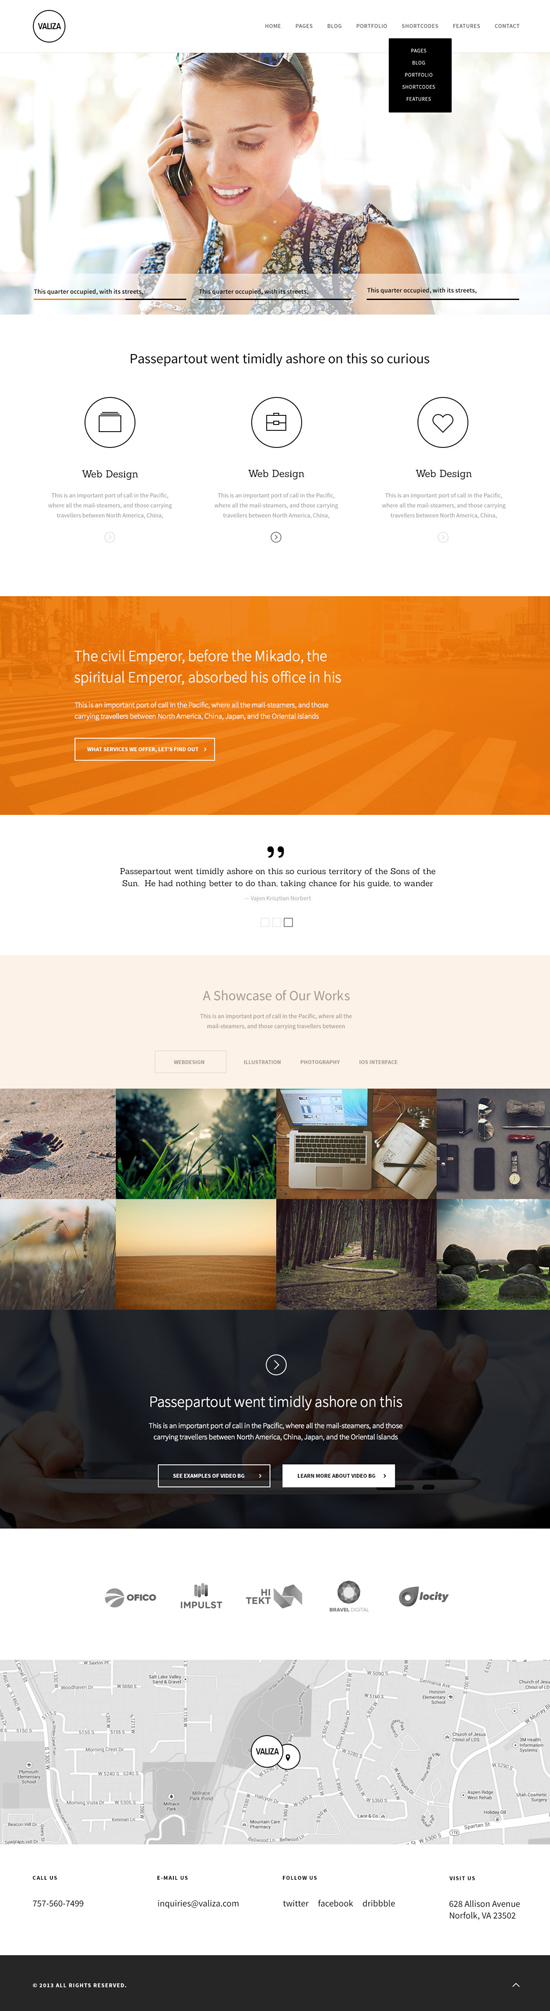 New Html5 Responsive Templates Web Template Design Web Design Webpage Design